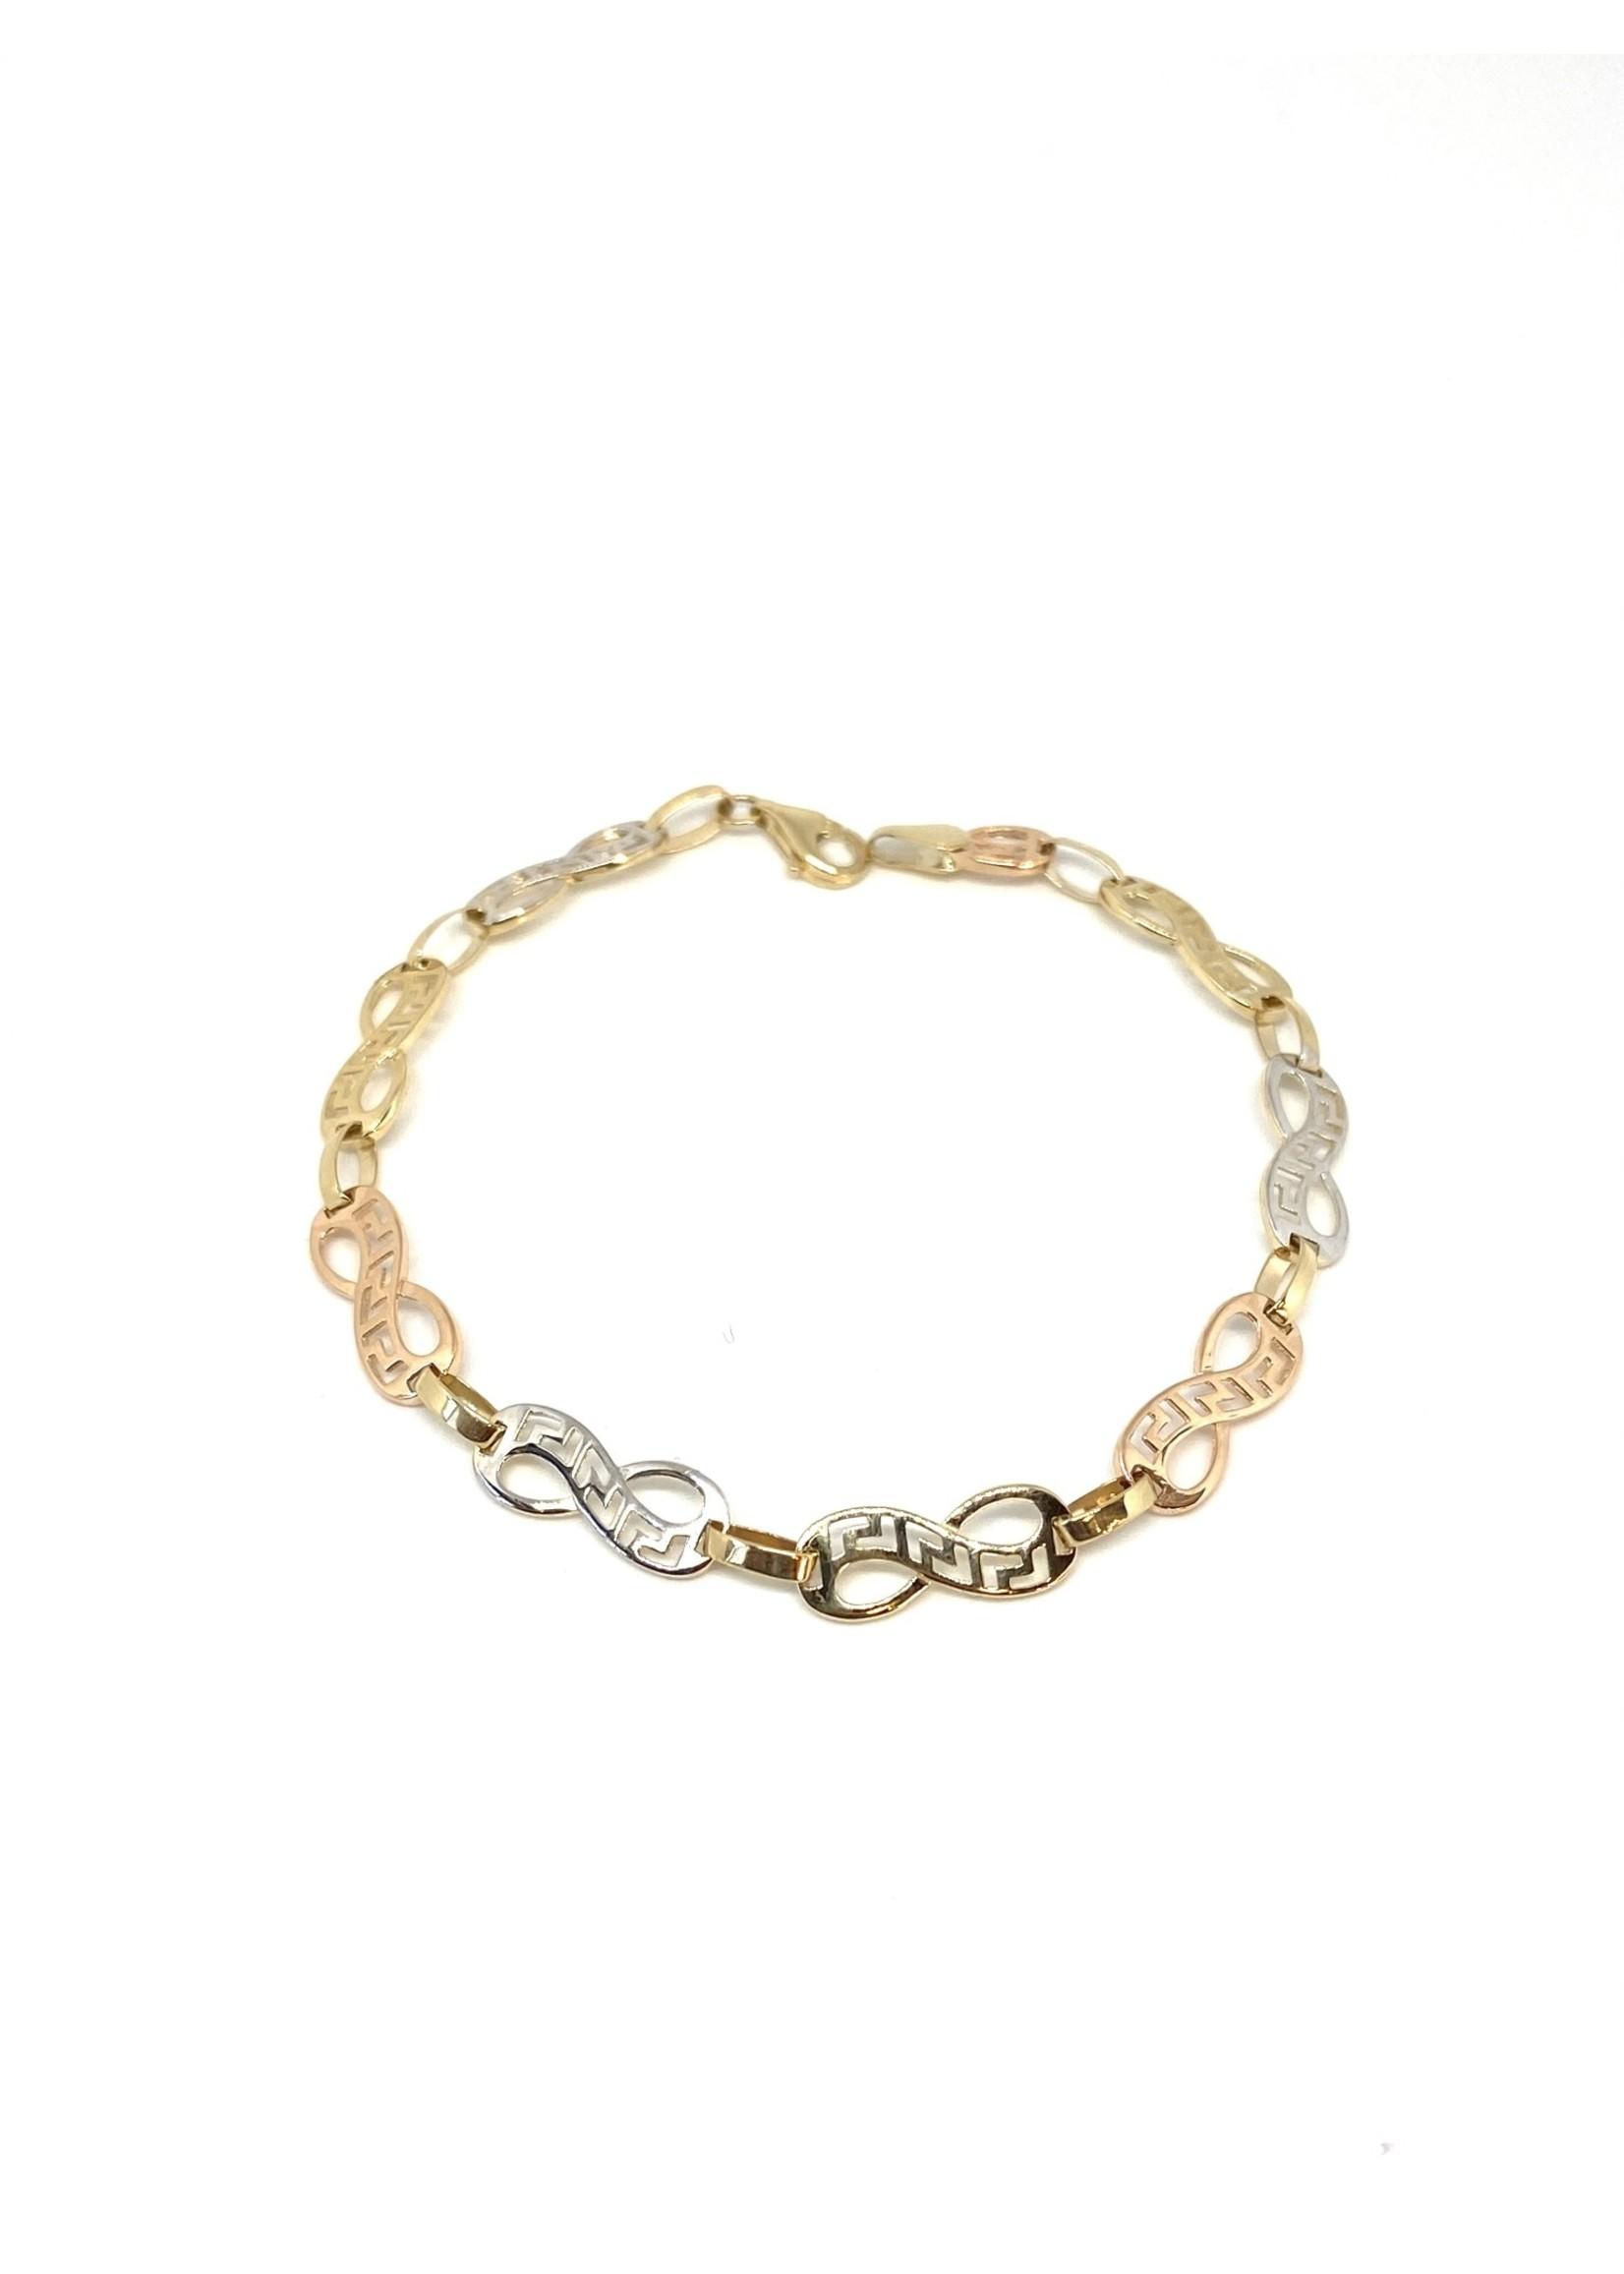 Bracelet Infini Versace Or 10K 3 tons